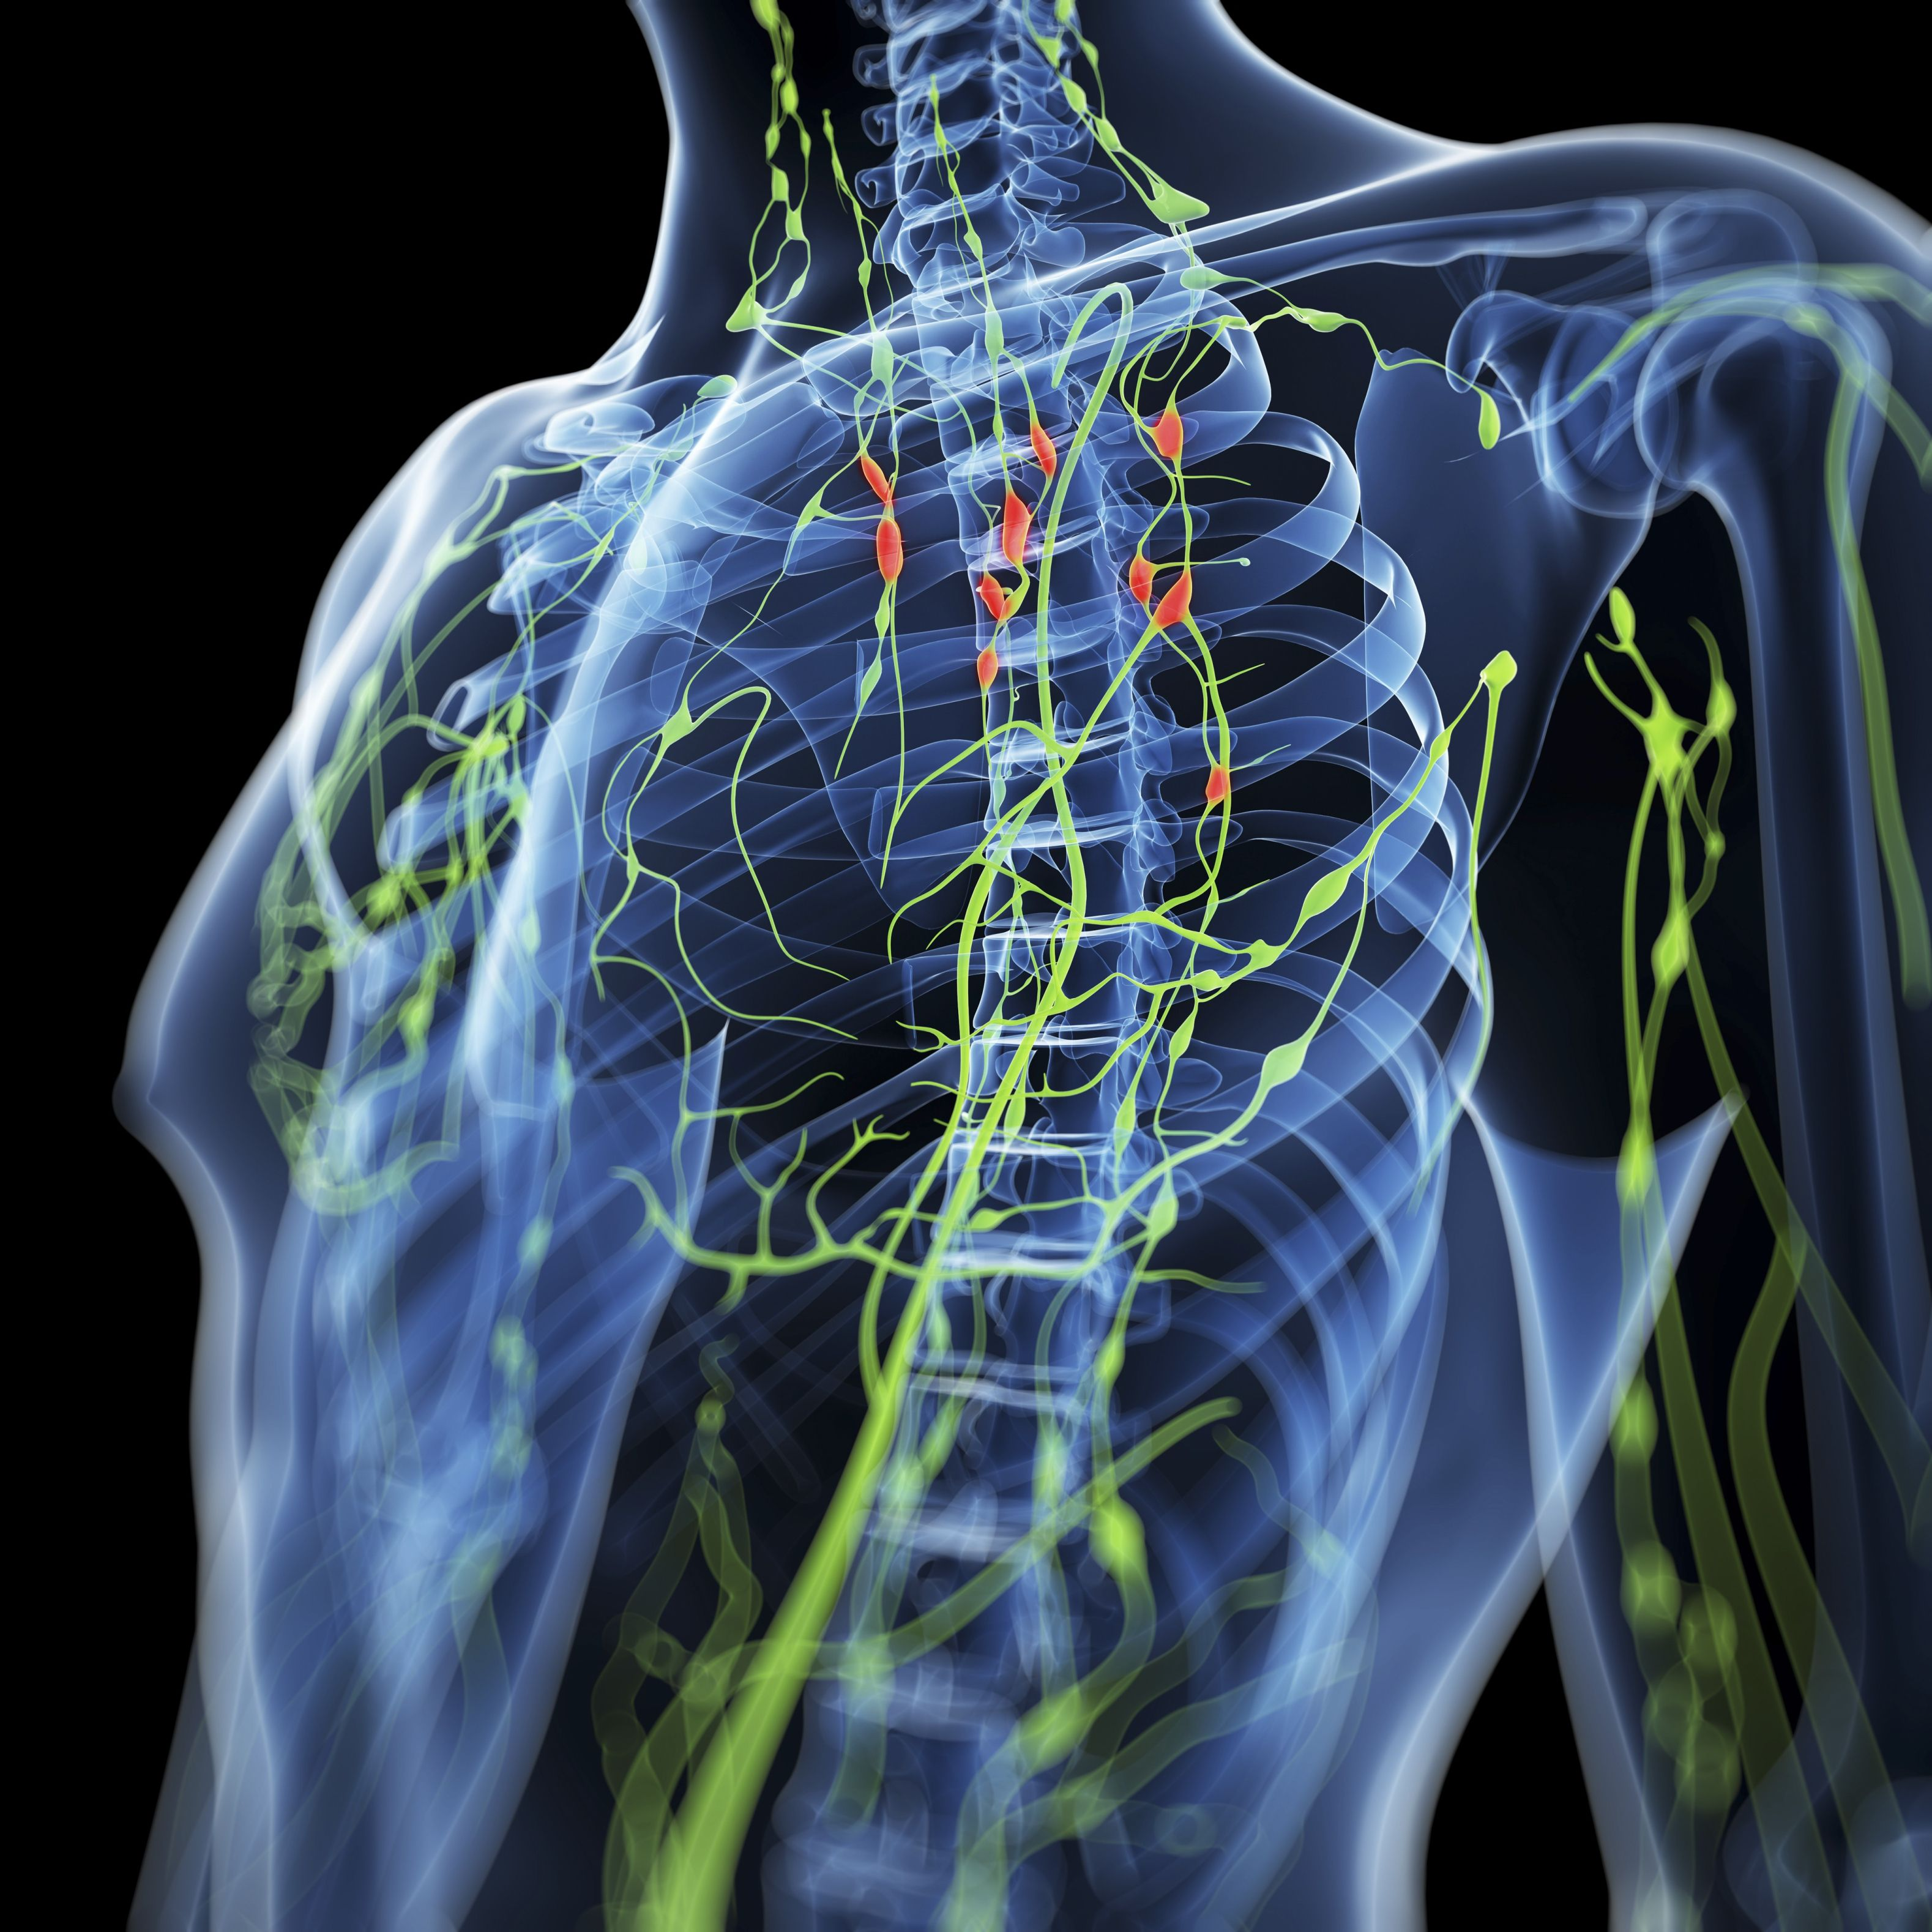 Nodular Sclerosing Hodgkin Lymphoma Overview